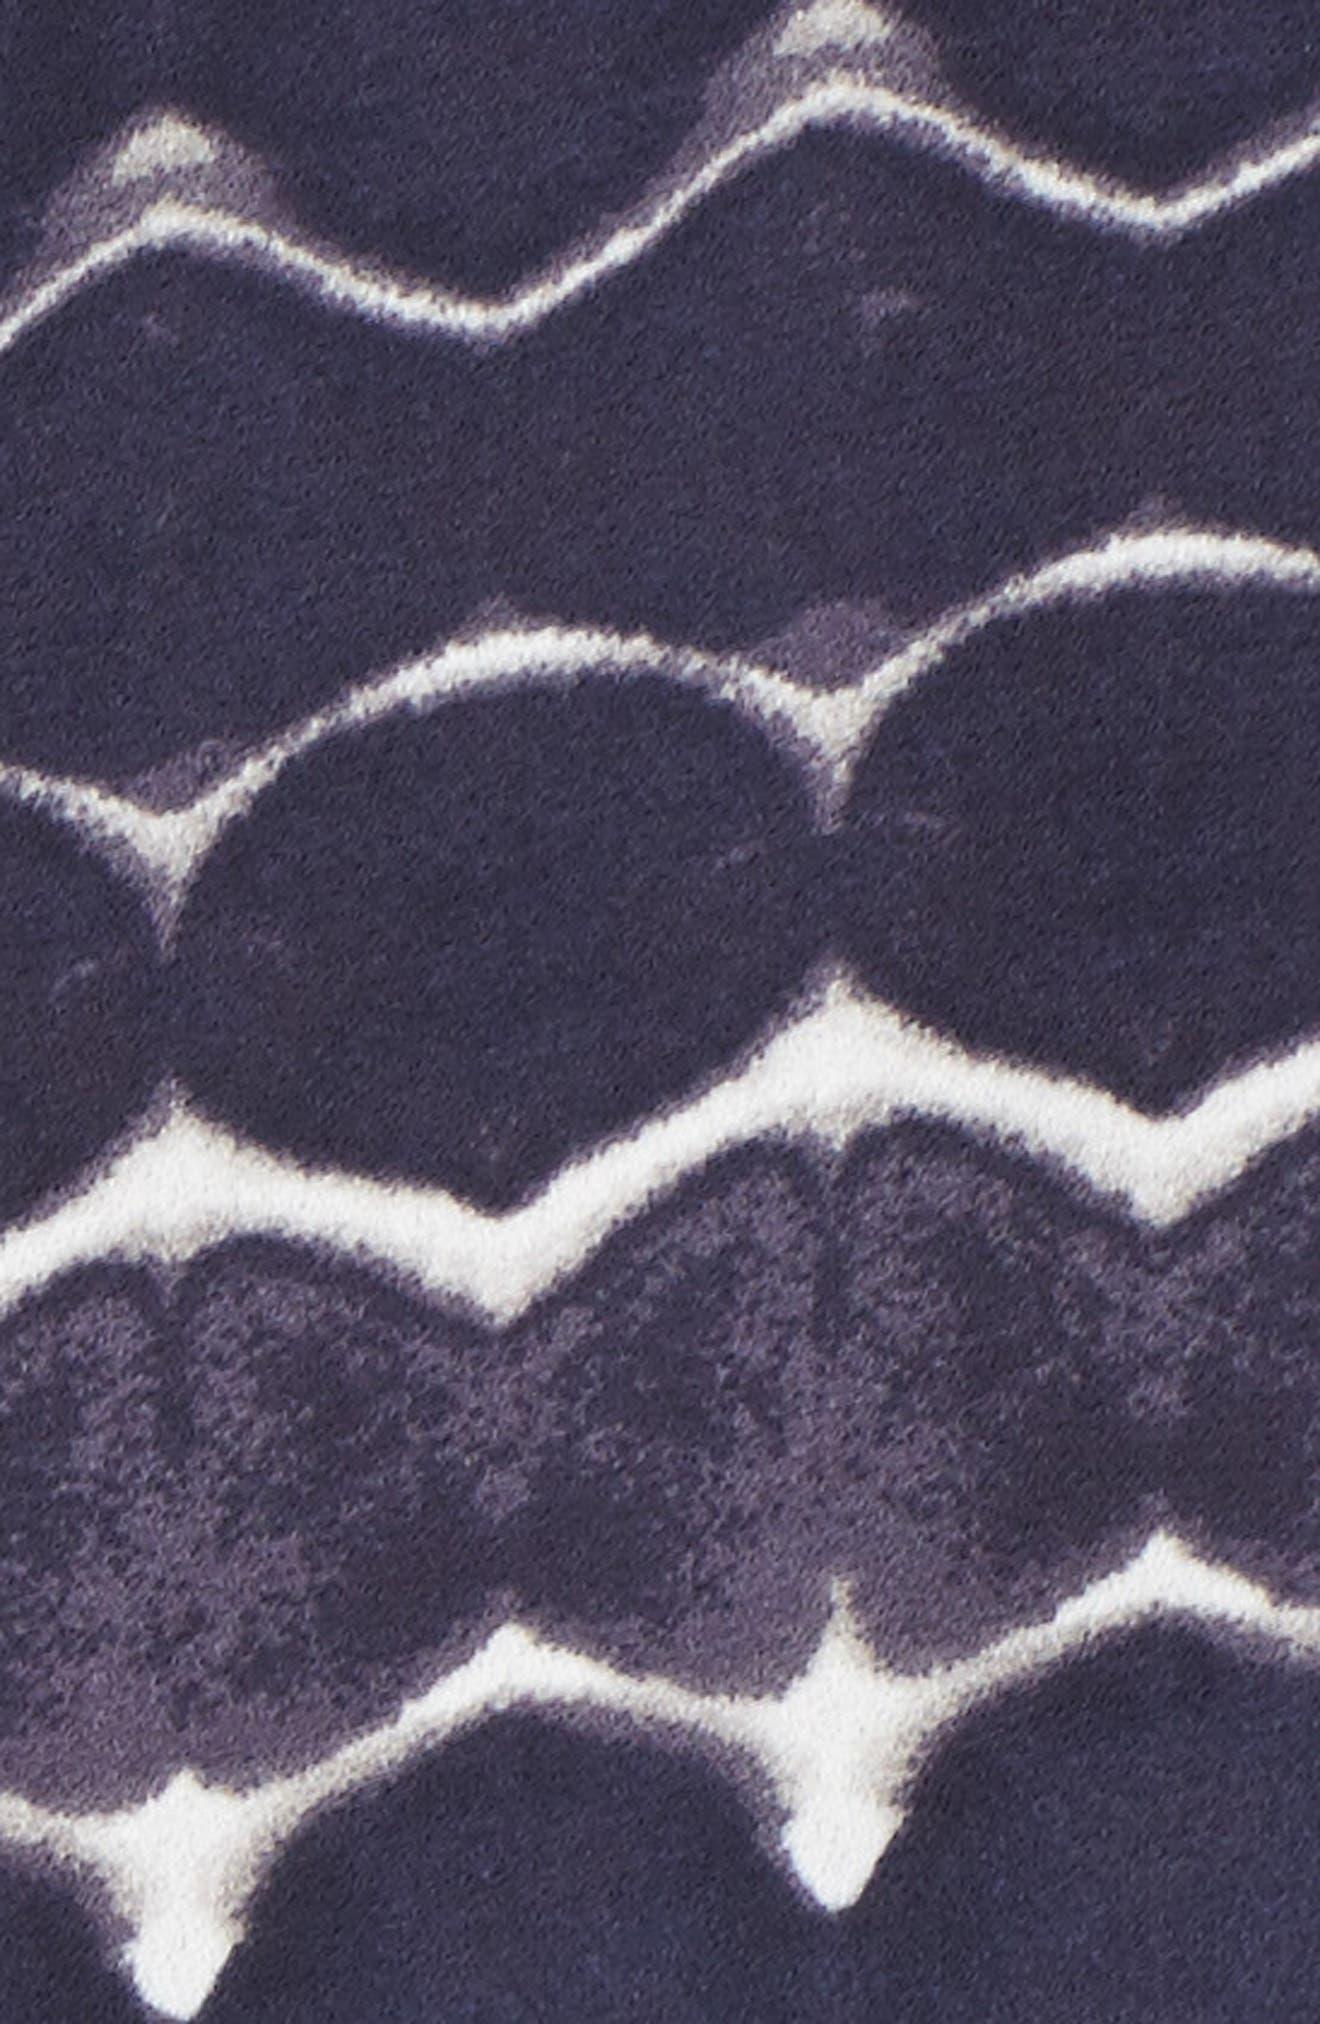 Drawstring Neck Crepe Top,                             Alternate thumbnail 19, color,